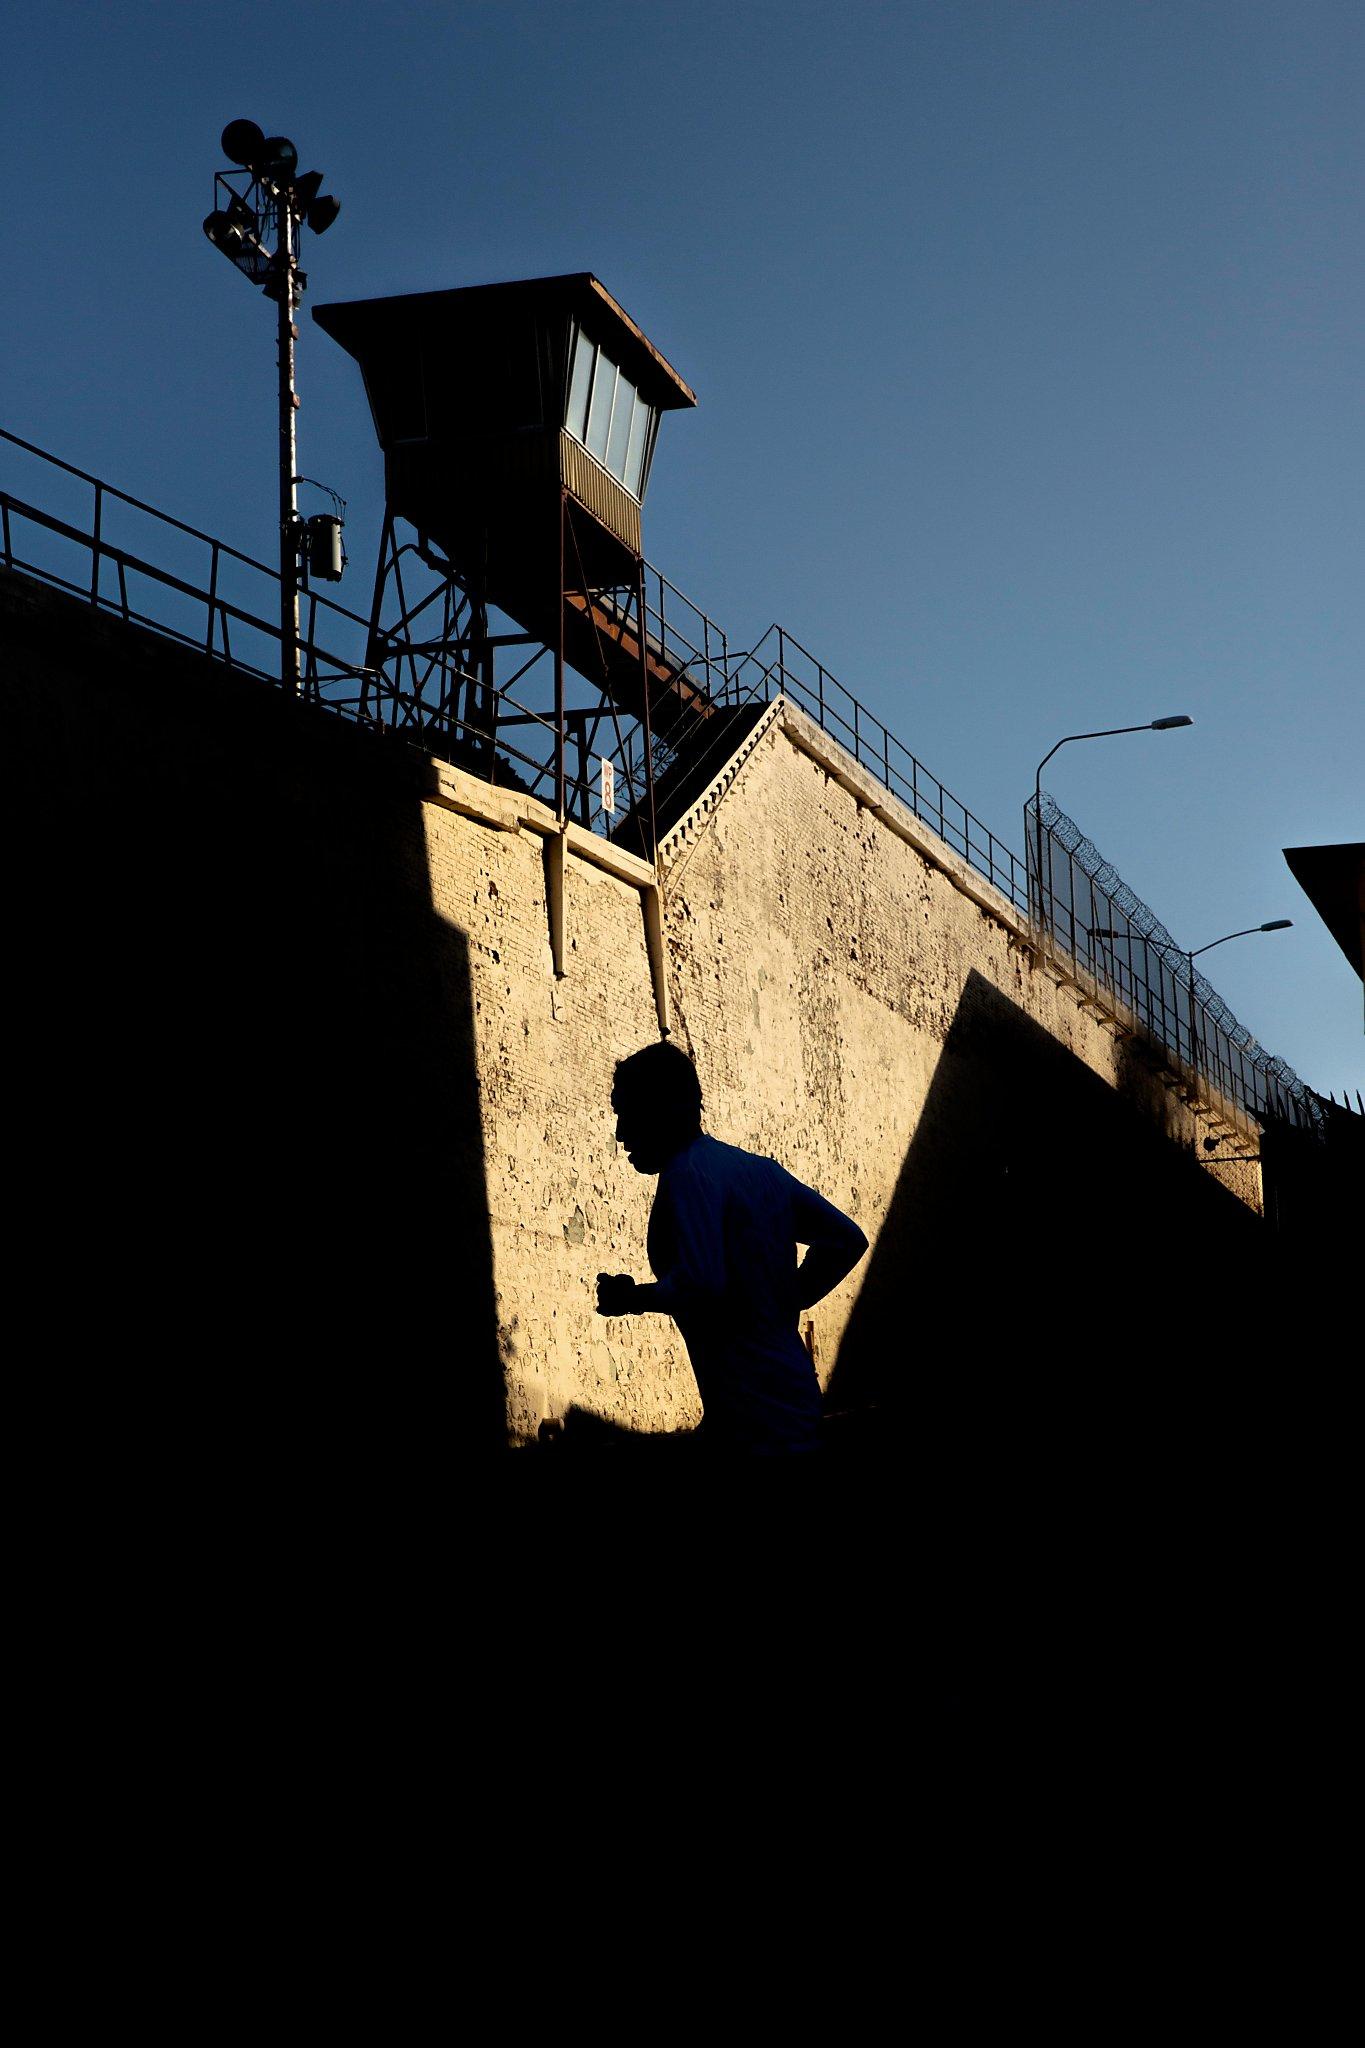 Oakland to lead school field trip Saturday - to San Quentin State Prison